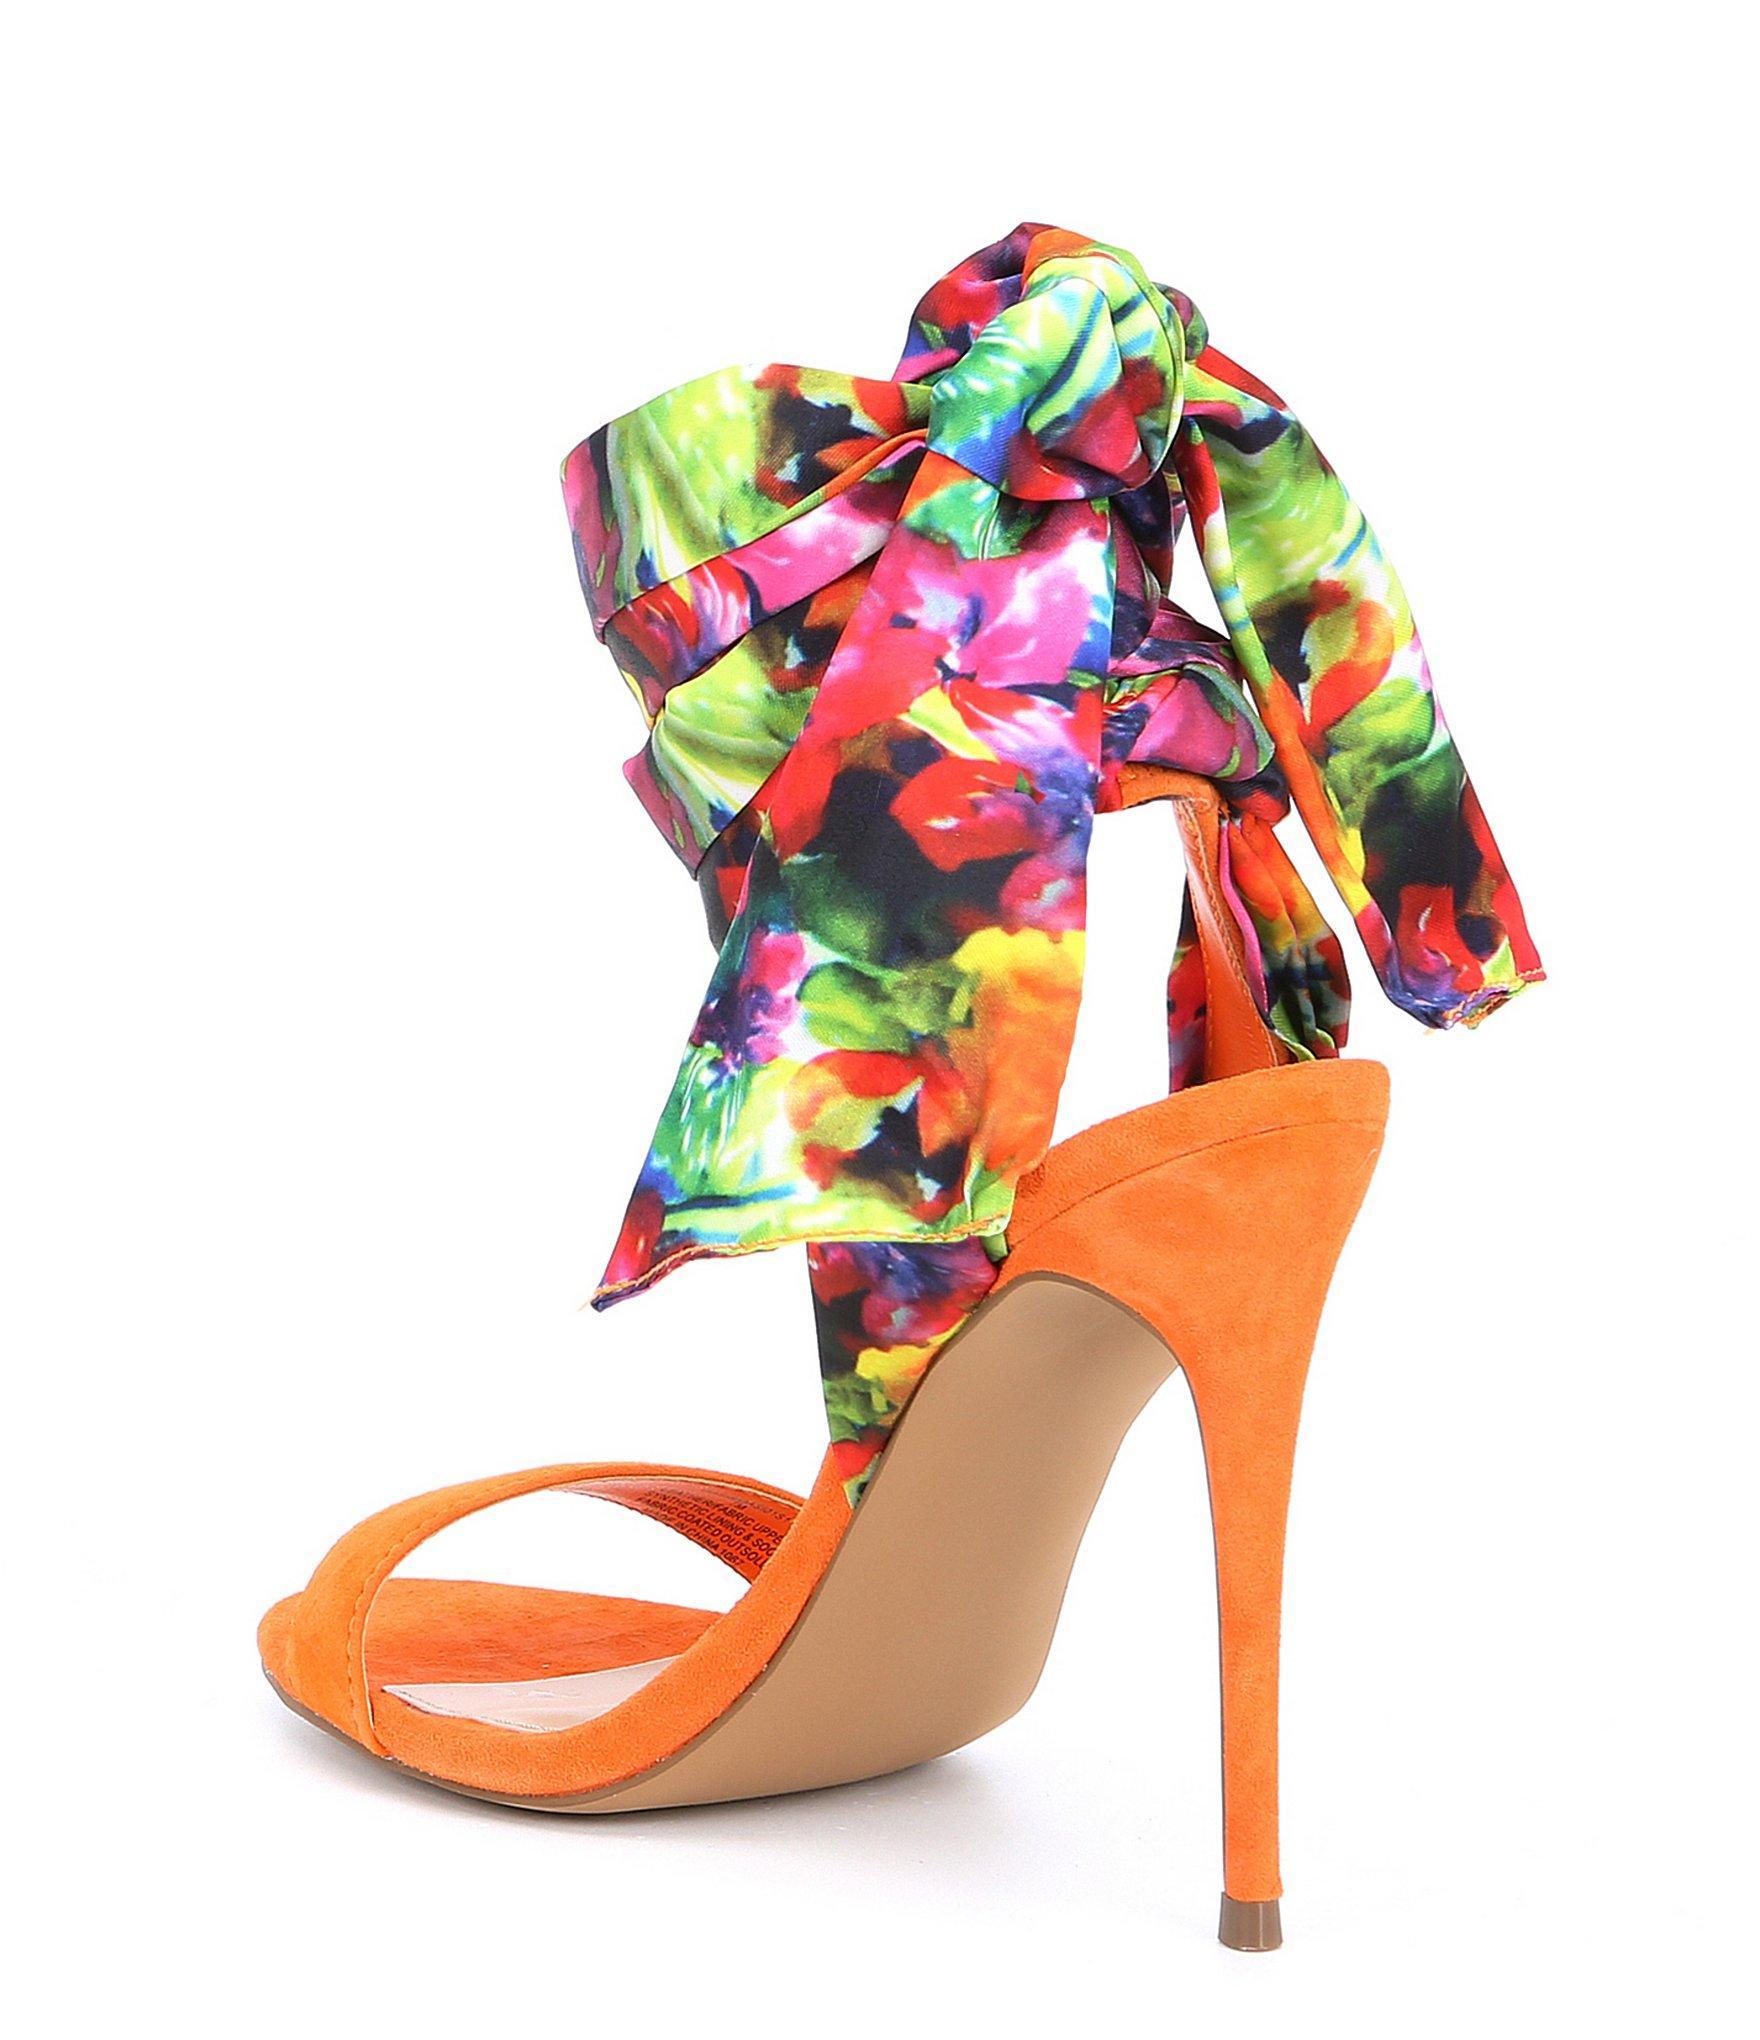 558bad3554c Steve Madden Multicolor Oasis Floral Wrap-up Stiletto Sandals